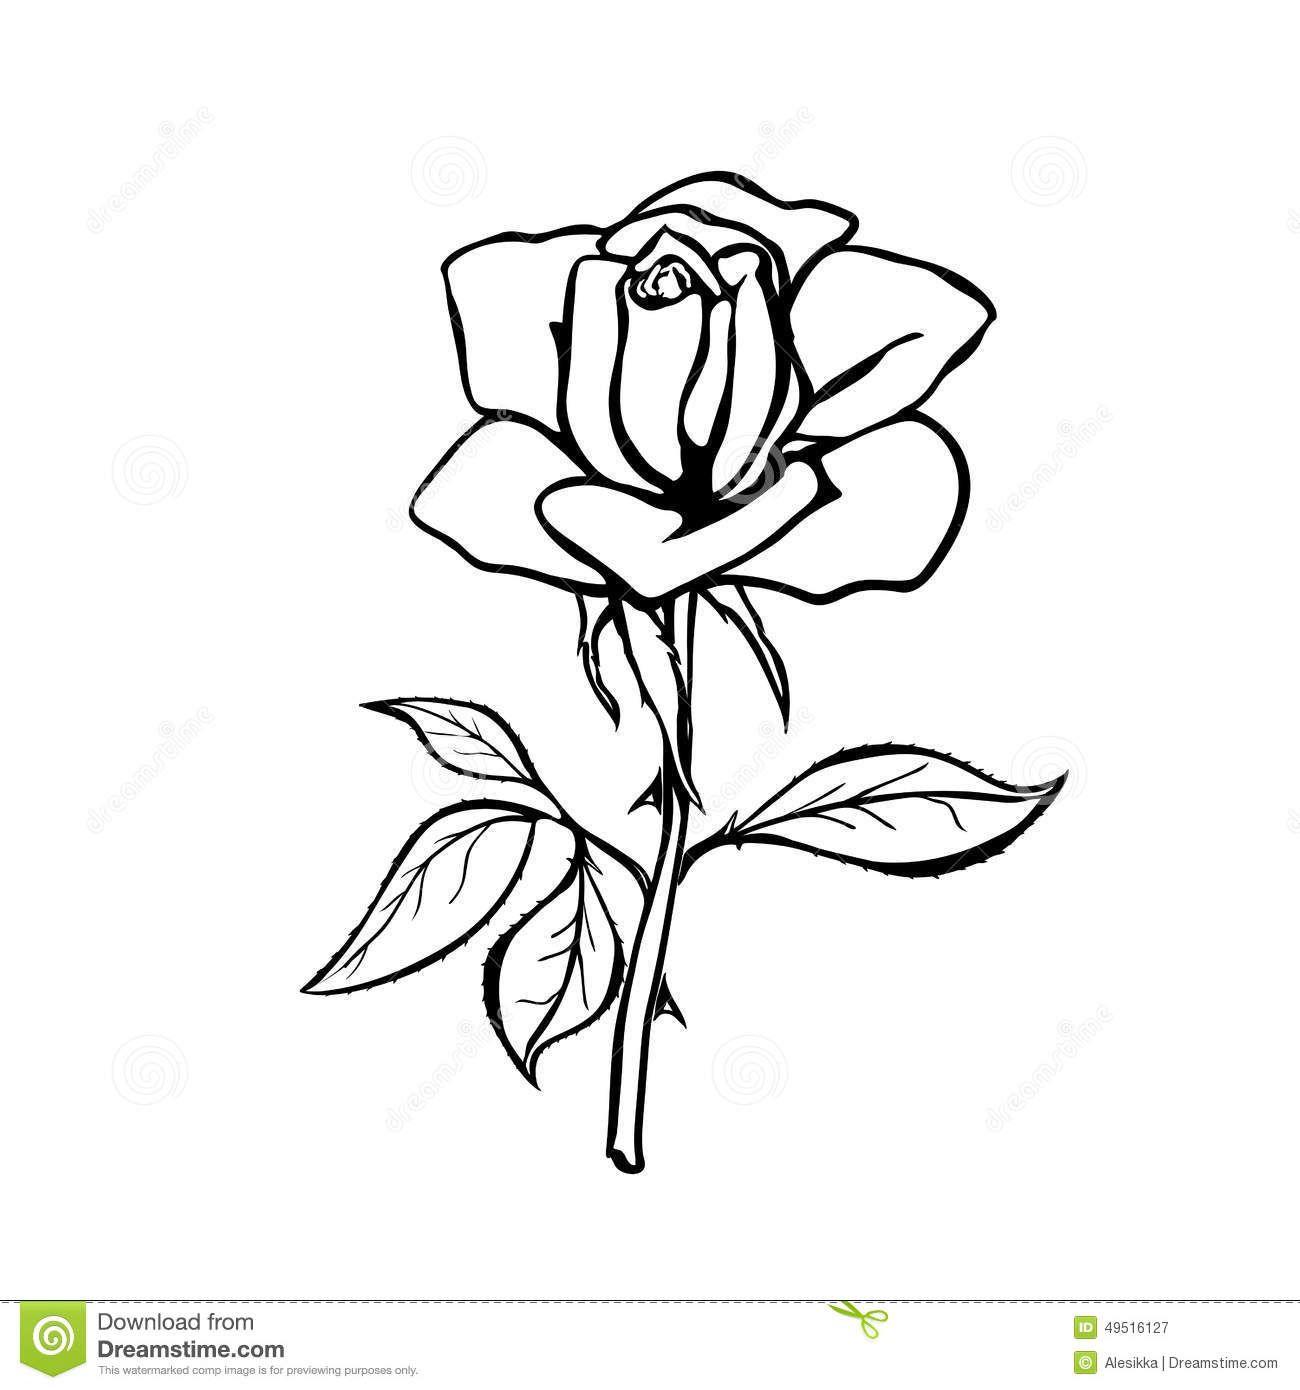 Realistic Rose Drawing Outline Fai Da Te Hobby